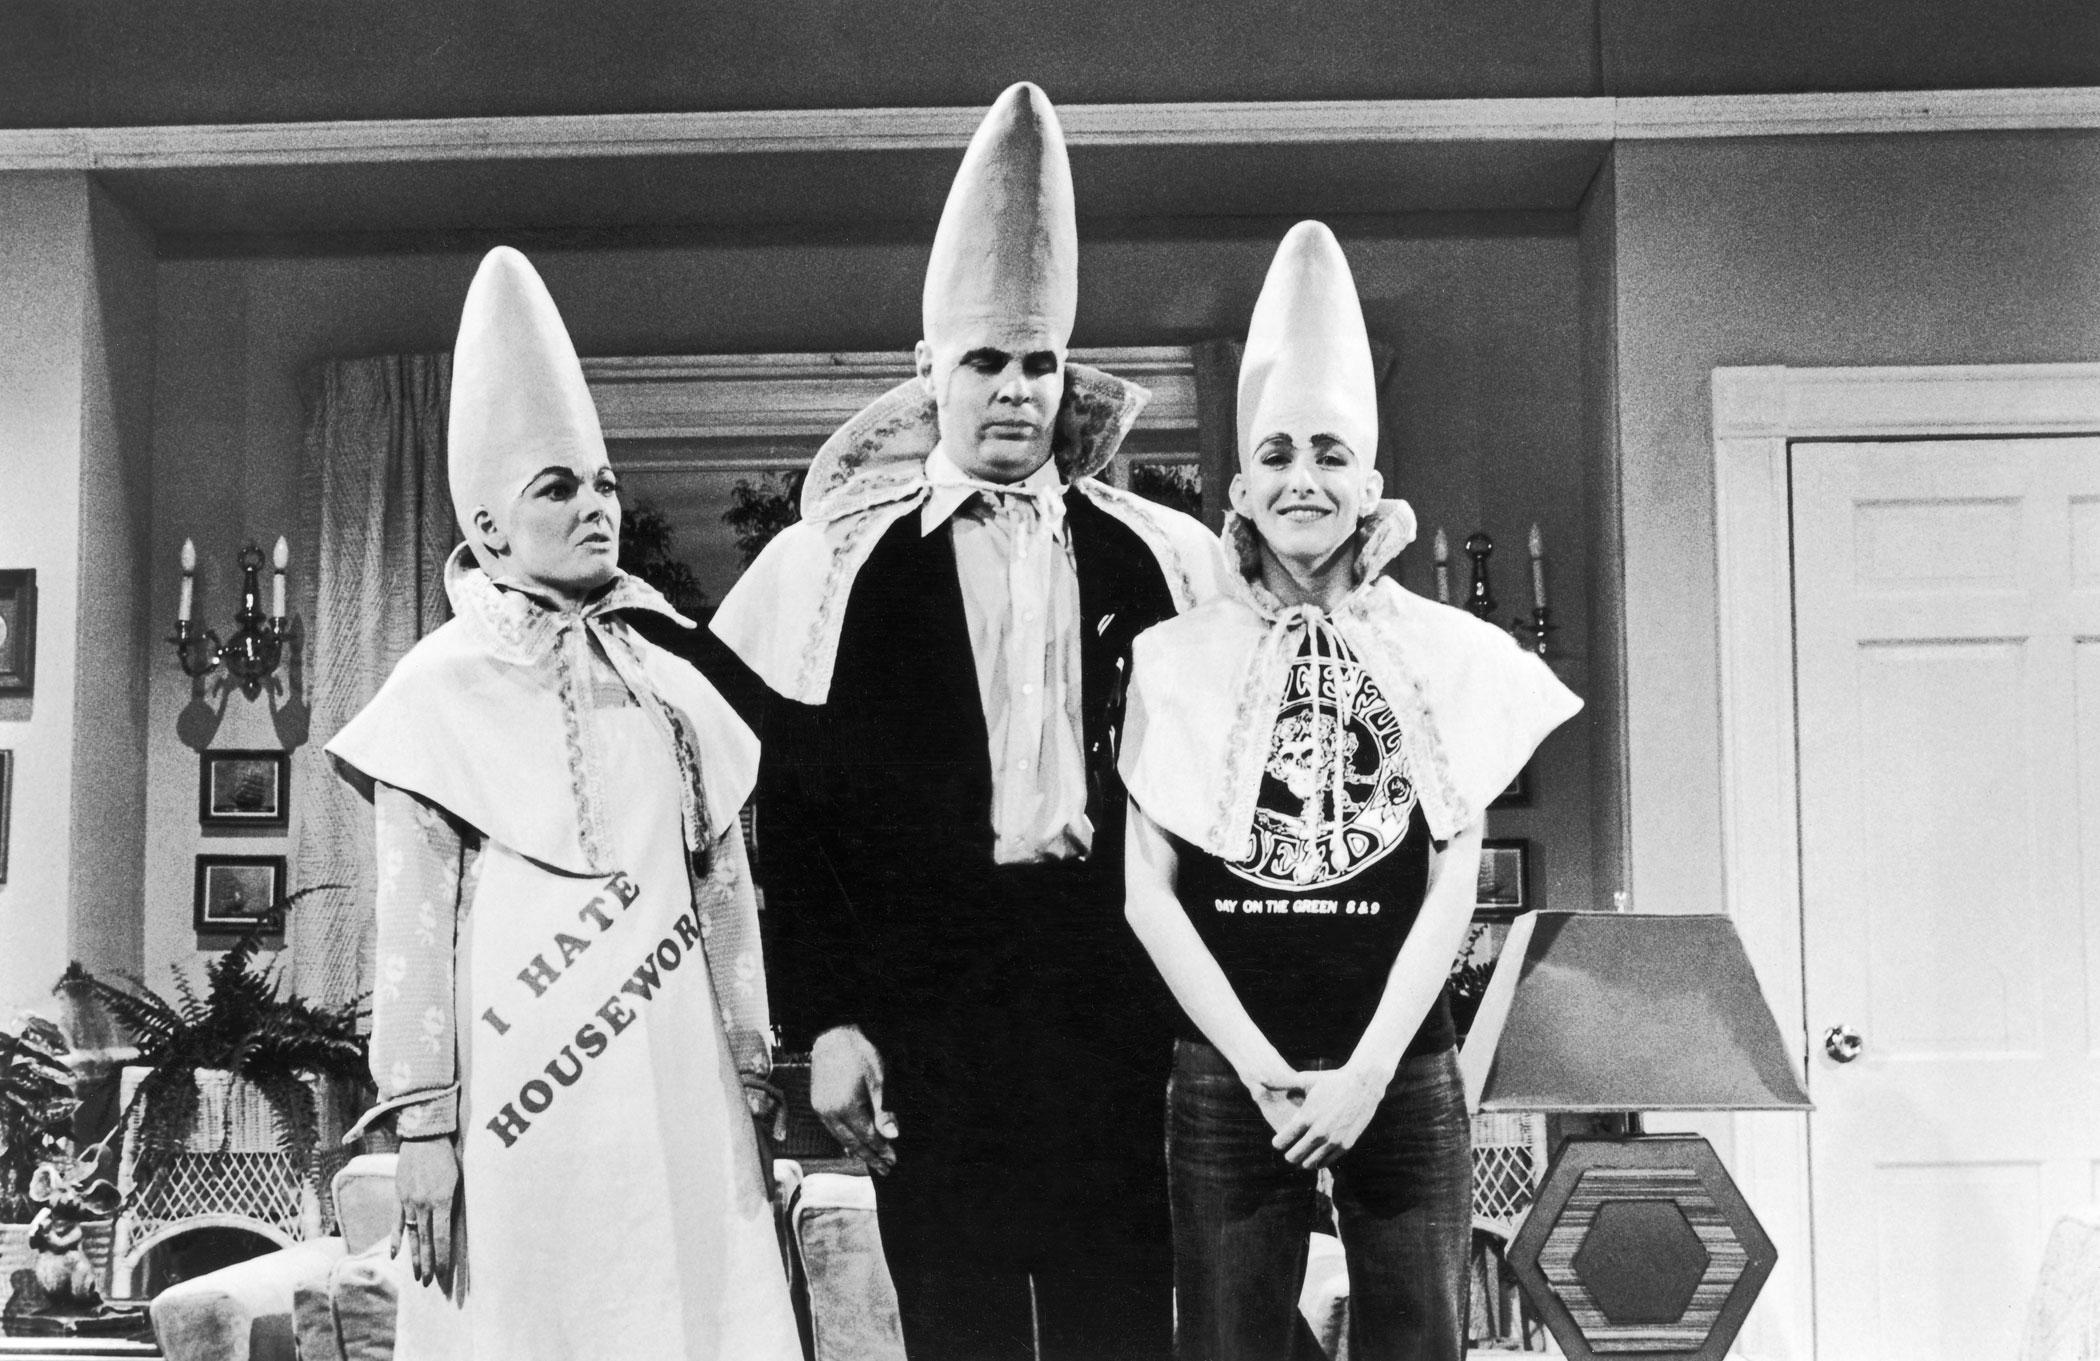 Jane Curtin, left, Dan Aykroyd and Laraine Newman, in their skit 'The Coneheads' circa 1970s.